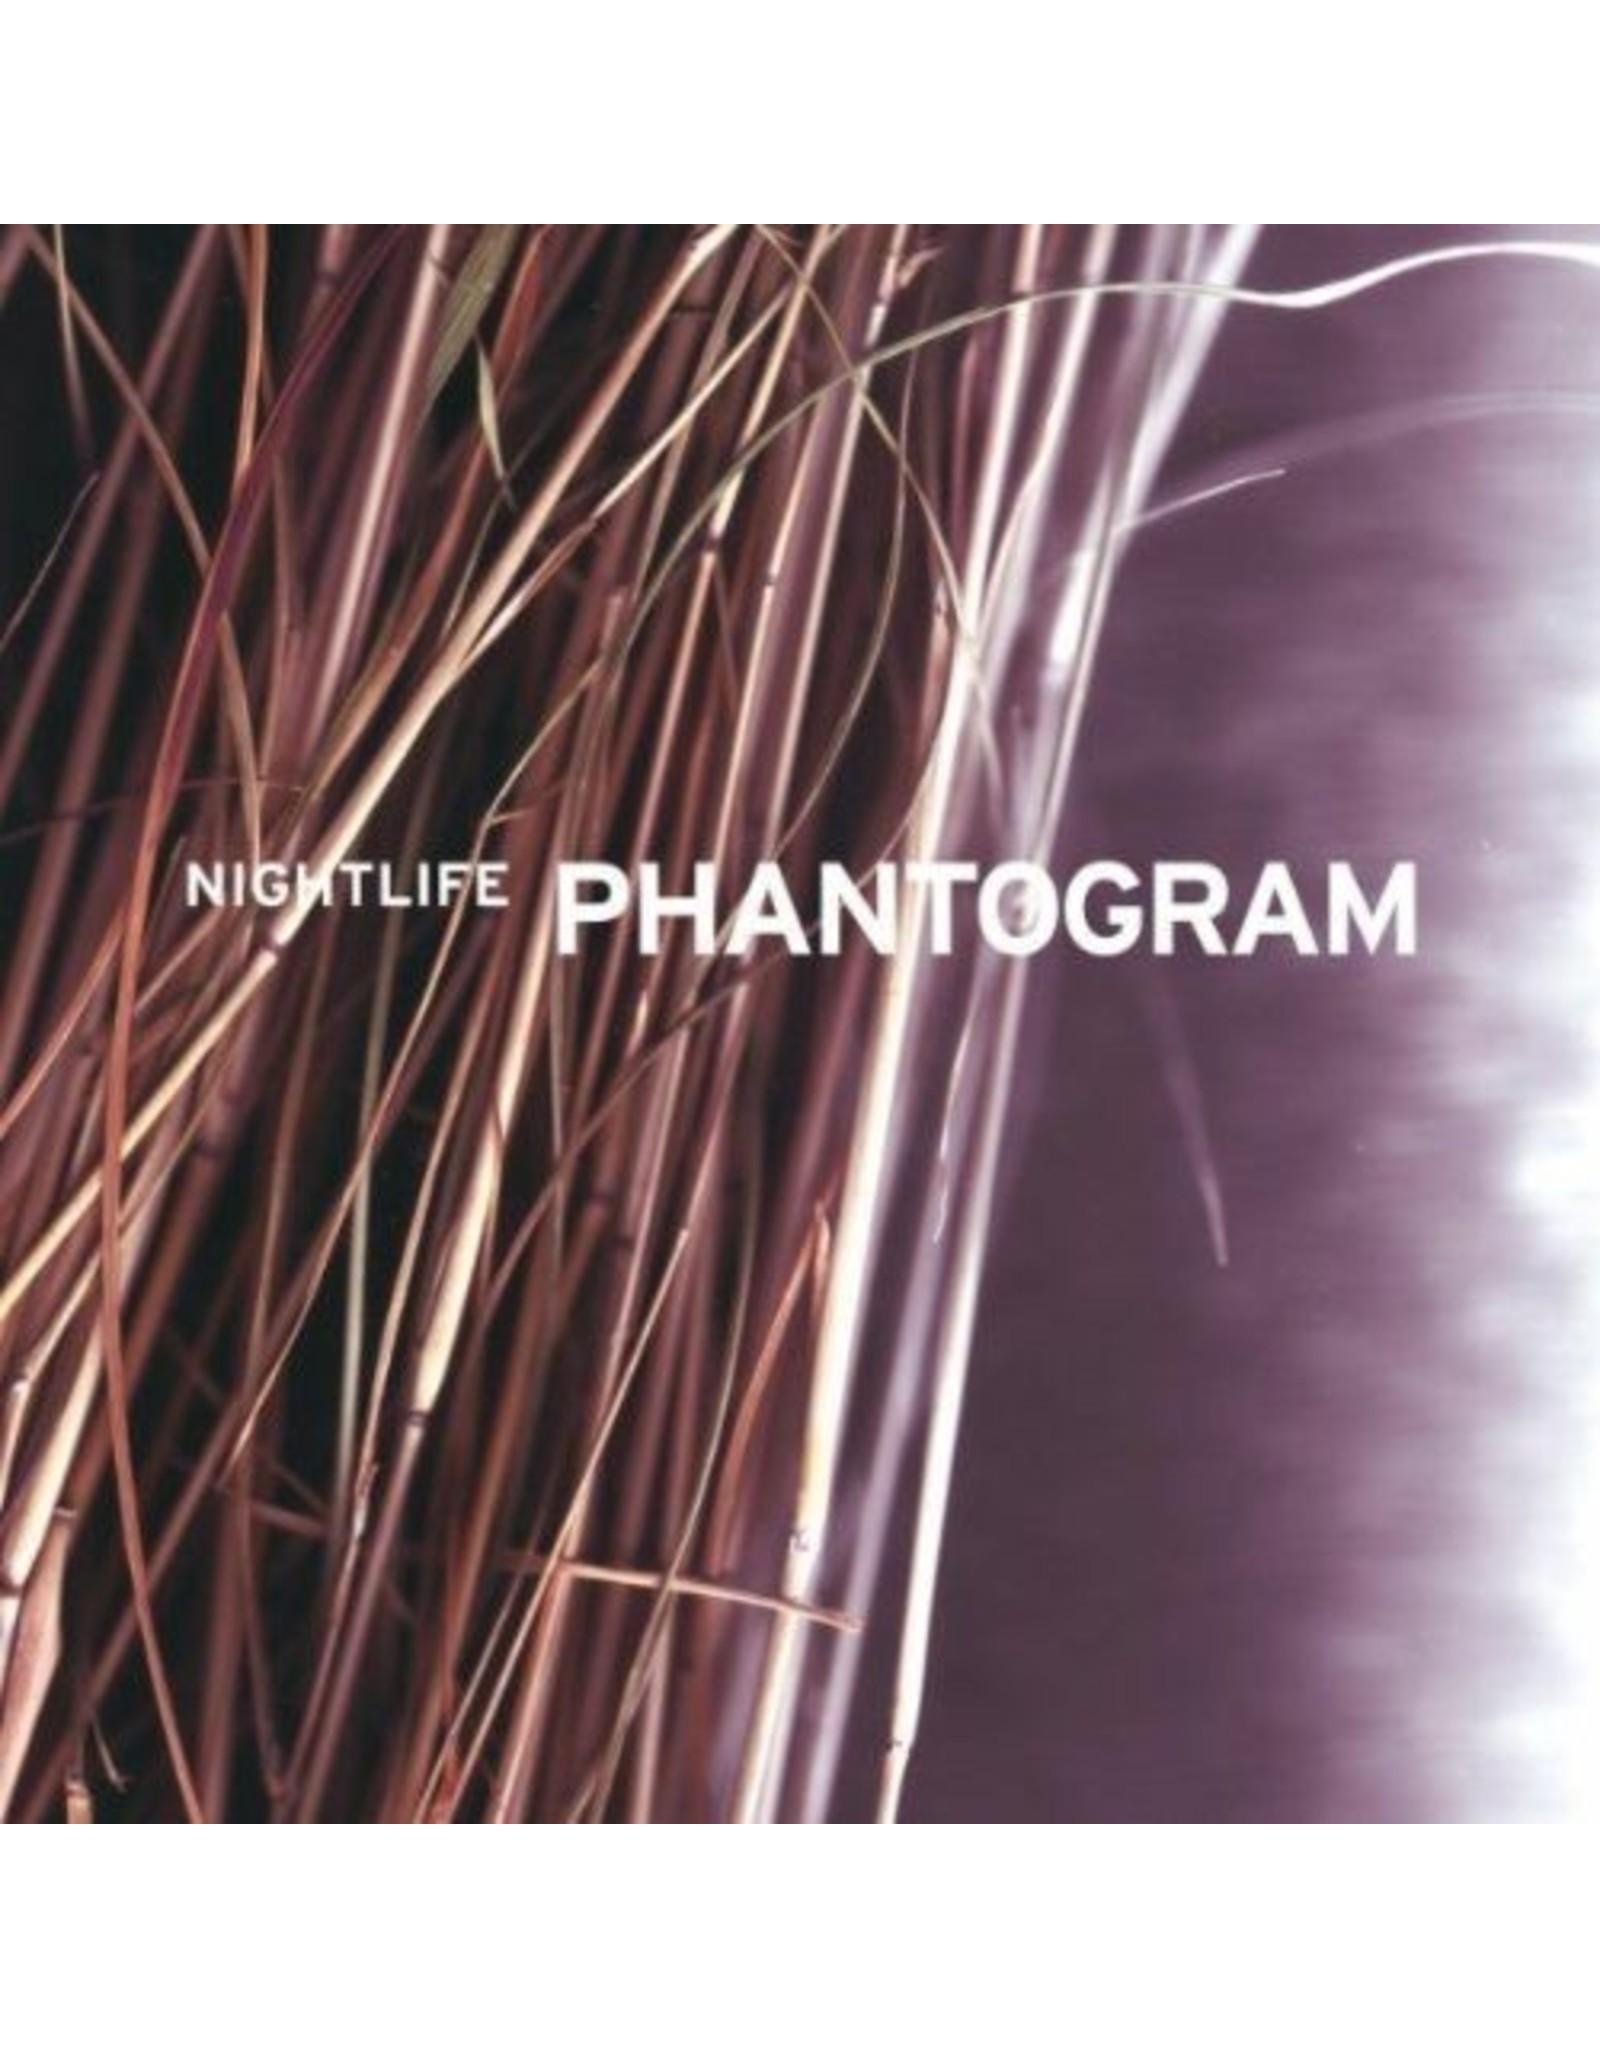 New Vinyl Phantogram - Nightlife LP